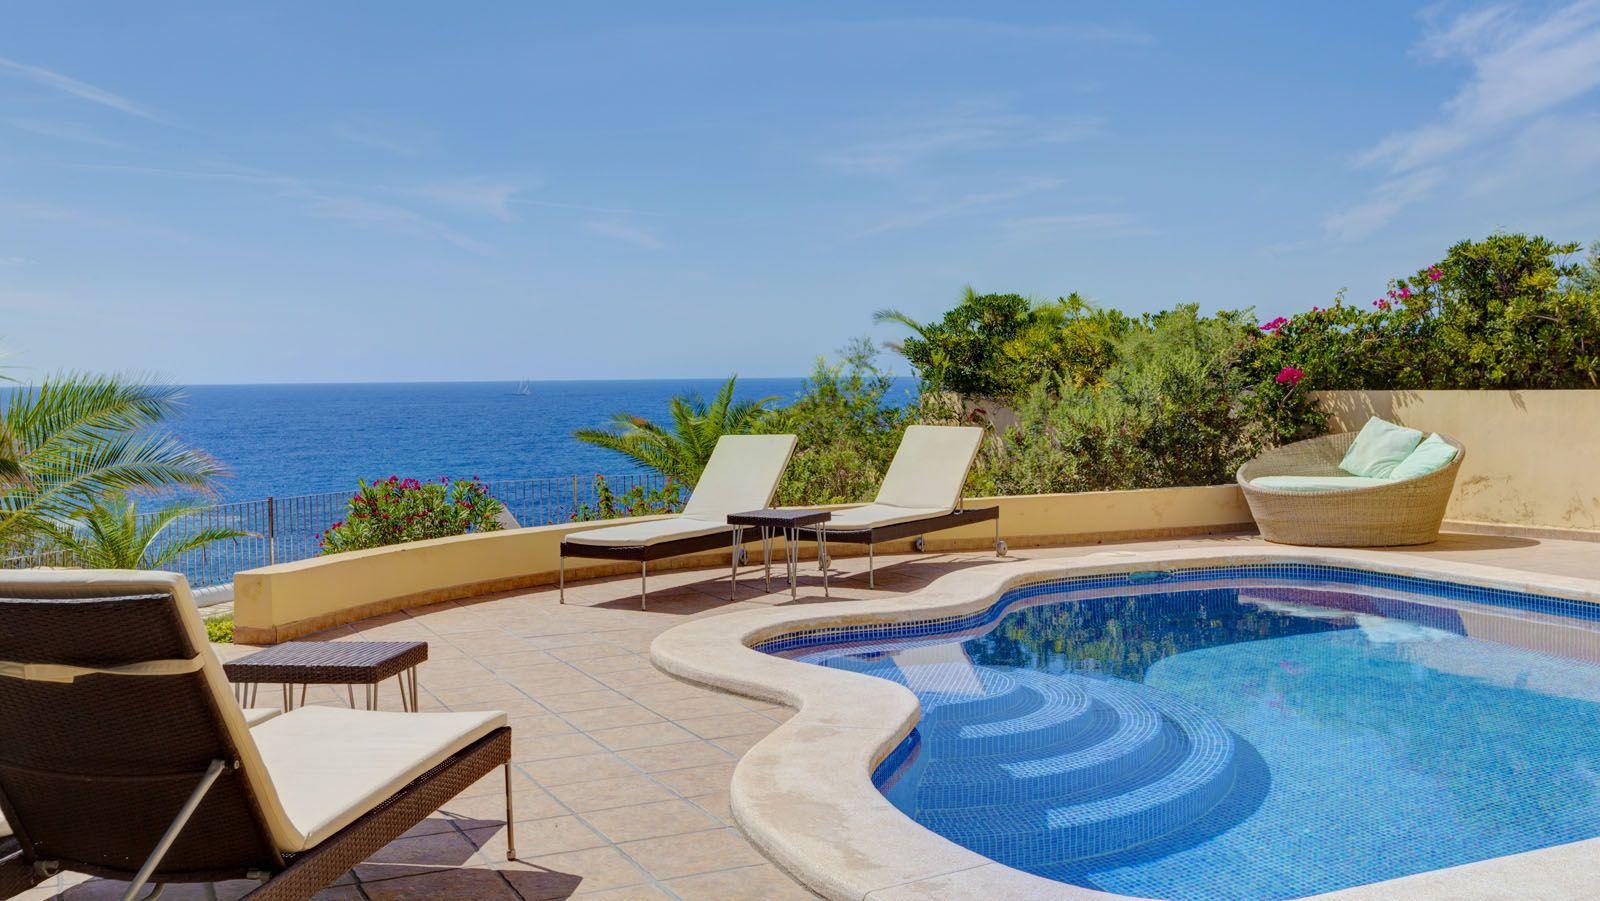 Villa in Wohnresidenz in erster Meereslinie in Nova Santa